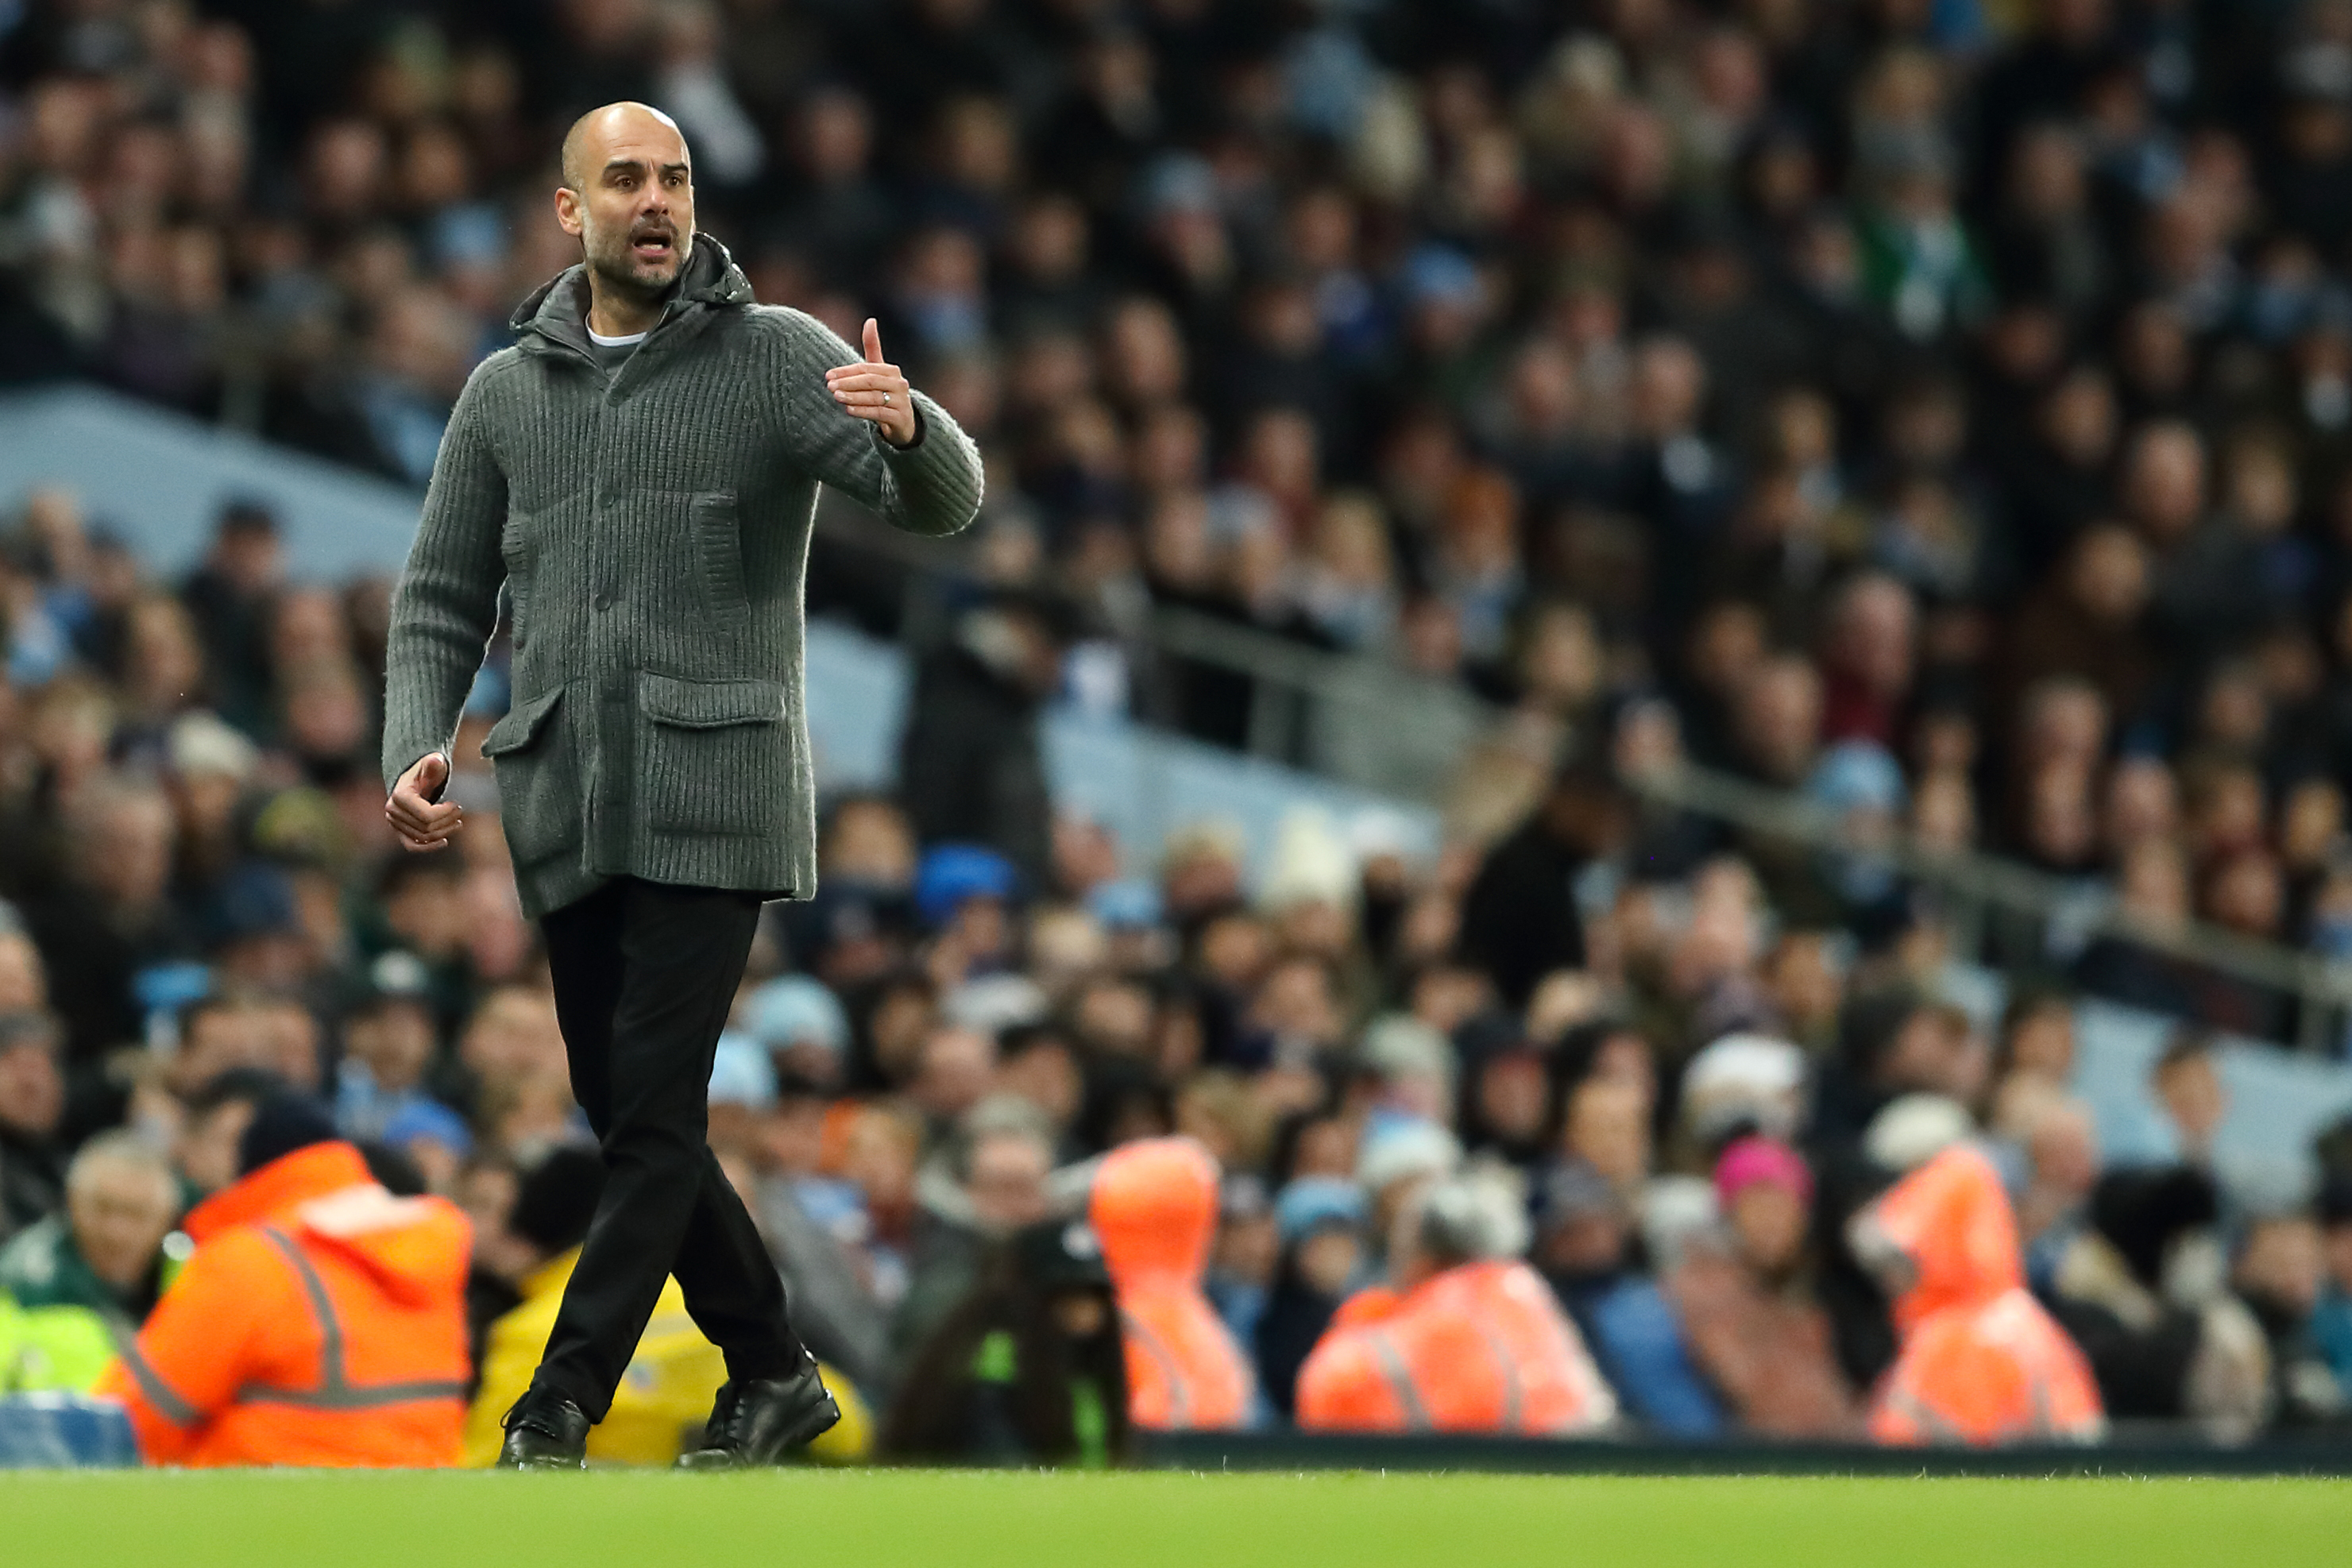 Pep Guardiola Dismisses Juventus Speculation, Won't Leave